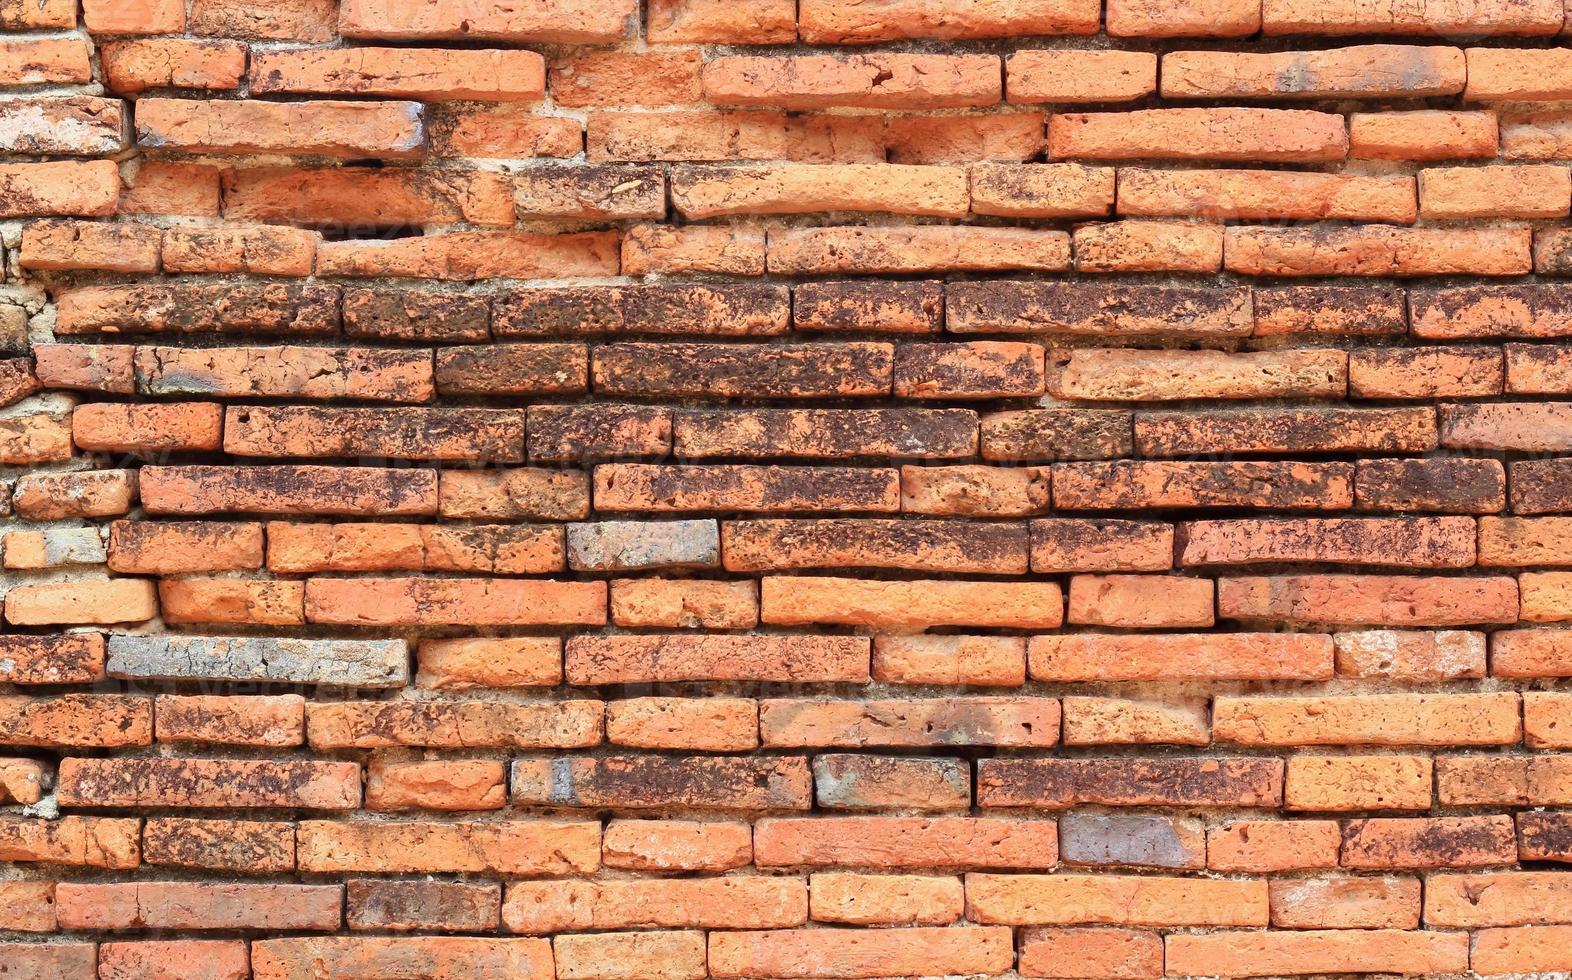 oude rode bakstenen muur textuur achtergrond foto